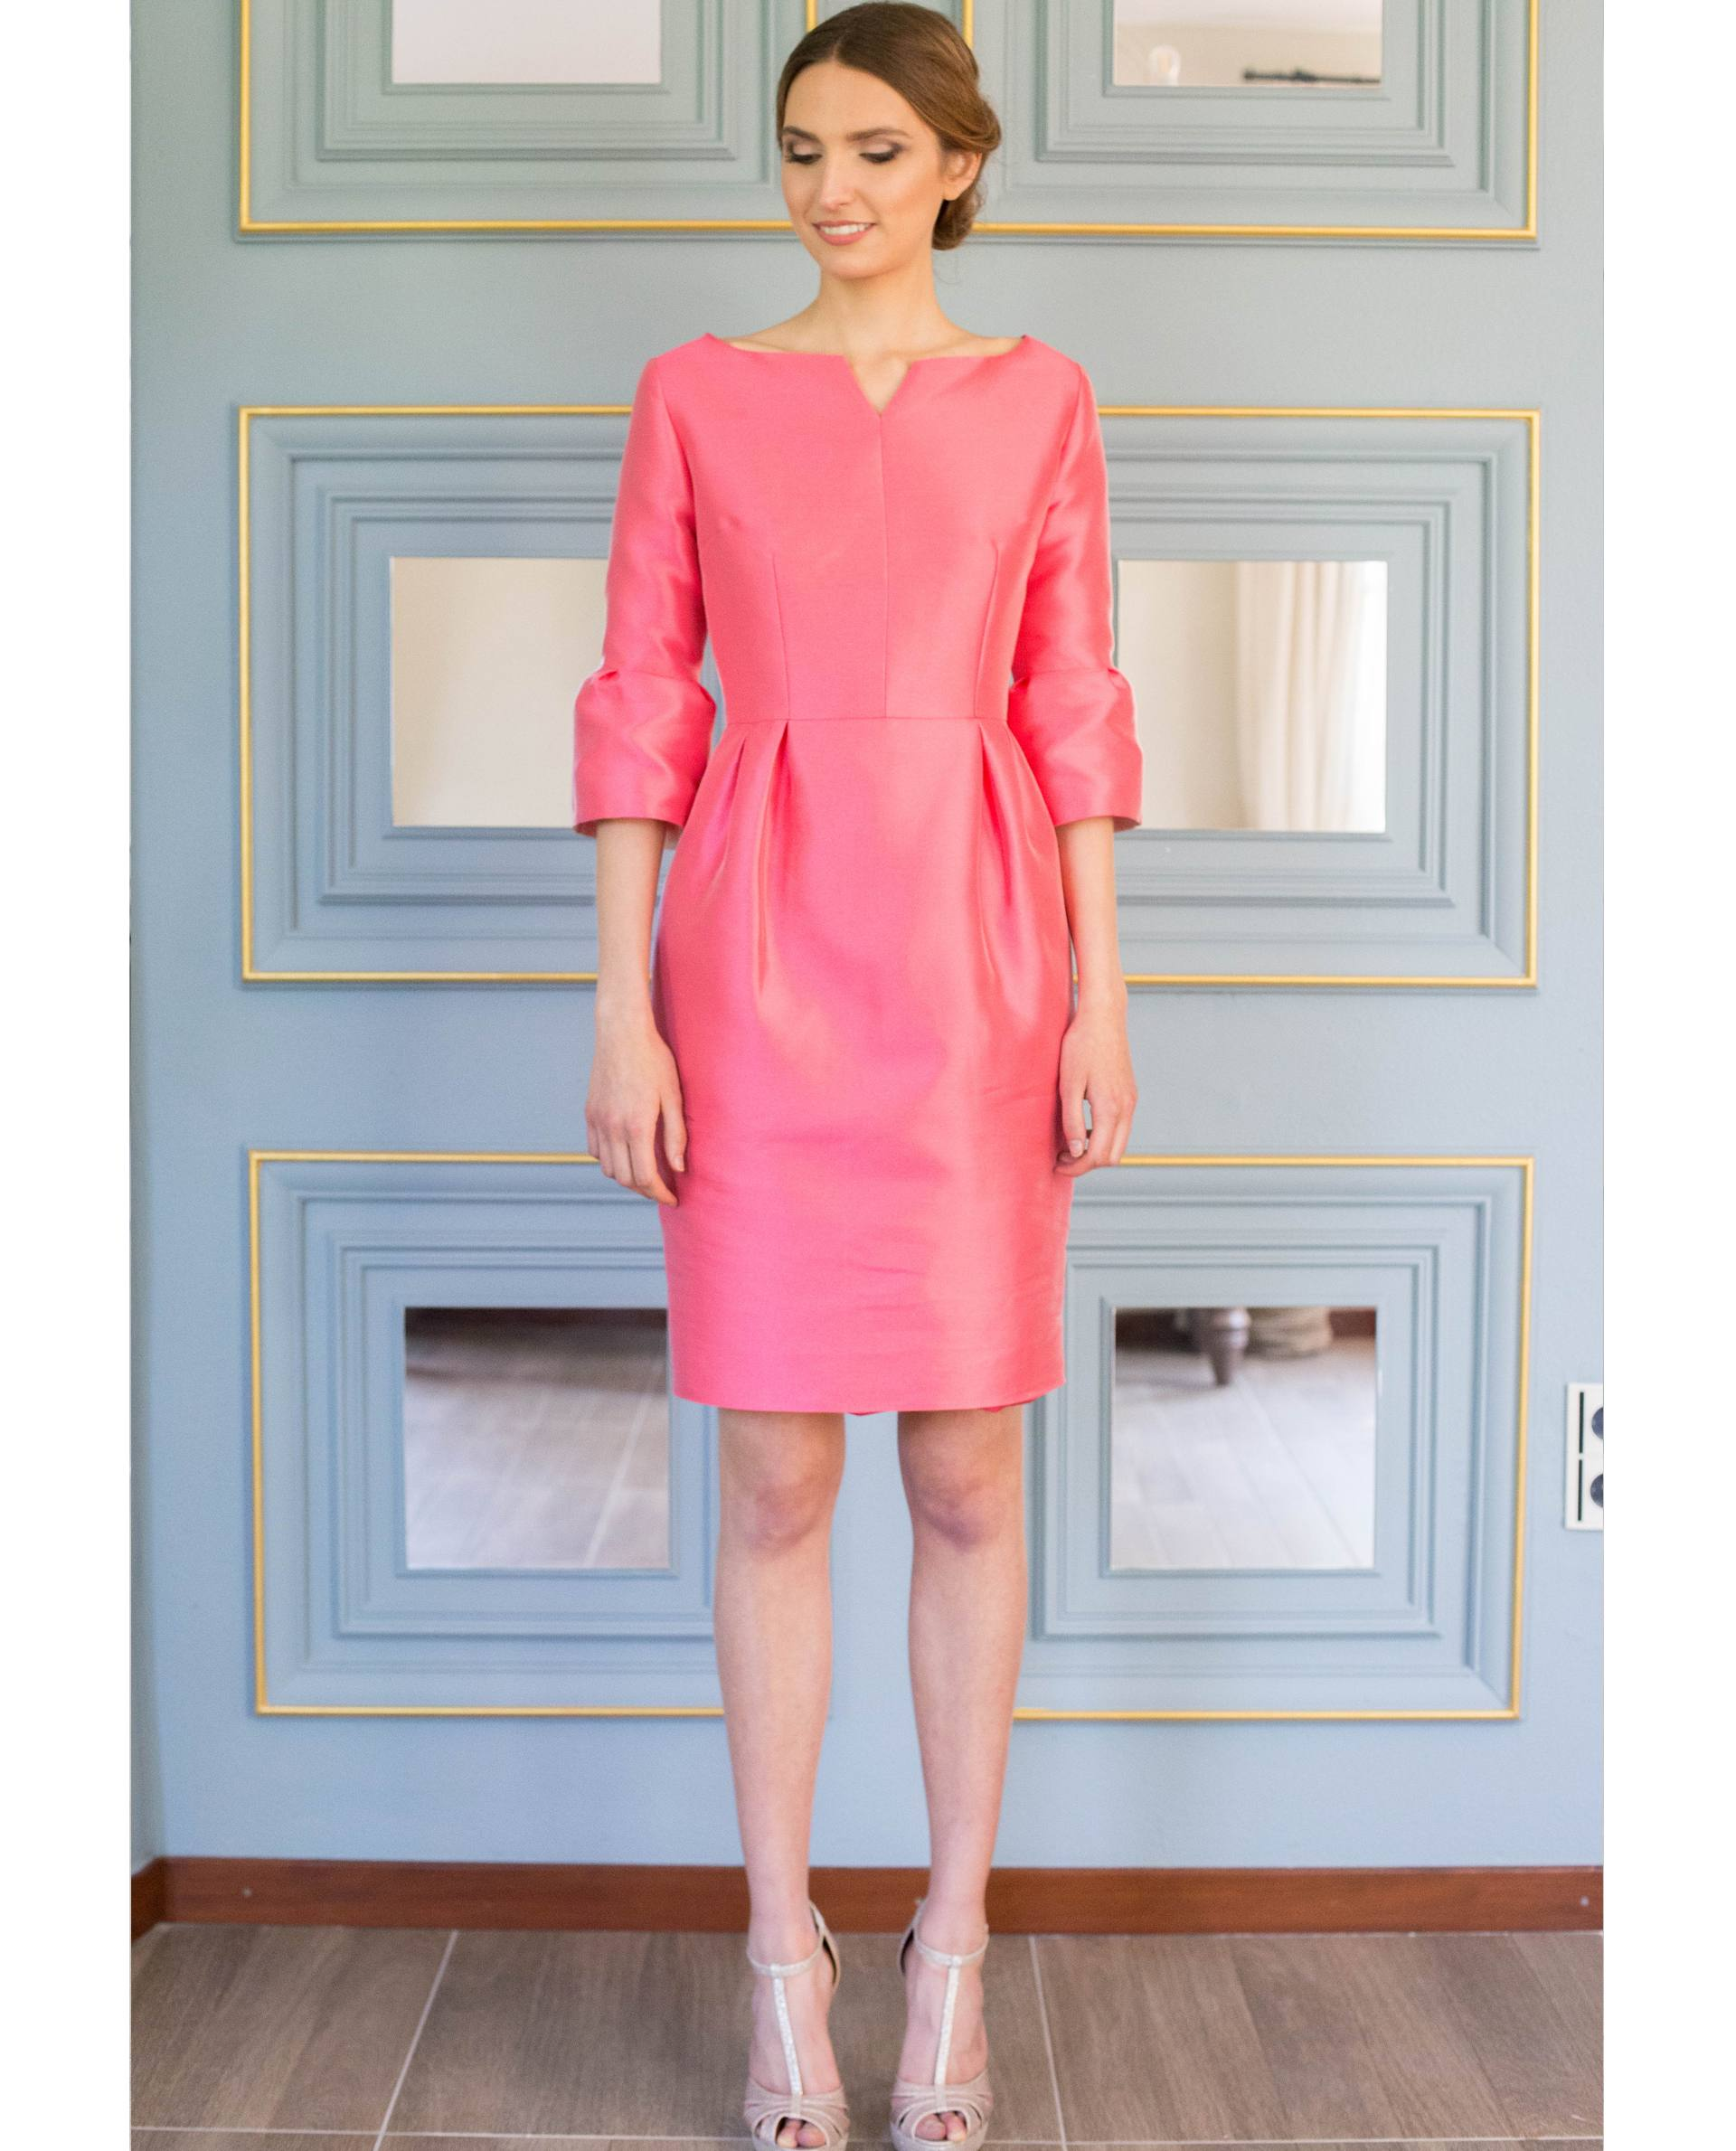 ATELIER-NATURE 2019 - VESTIDOS - vestido fiesta NORA rosa